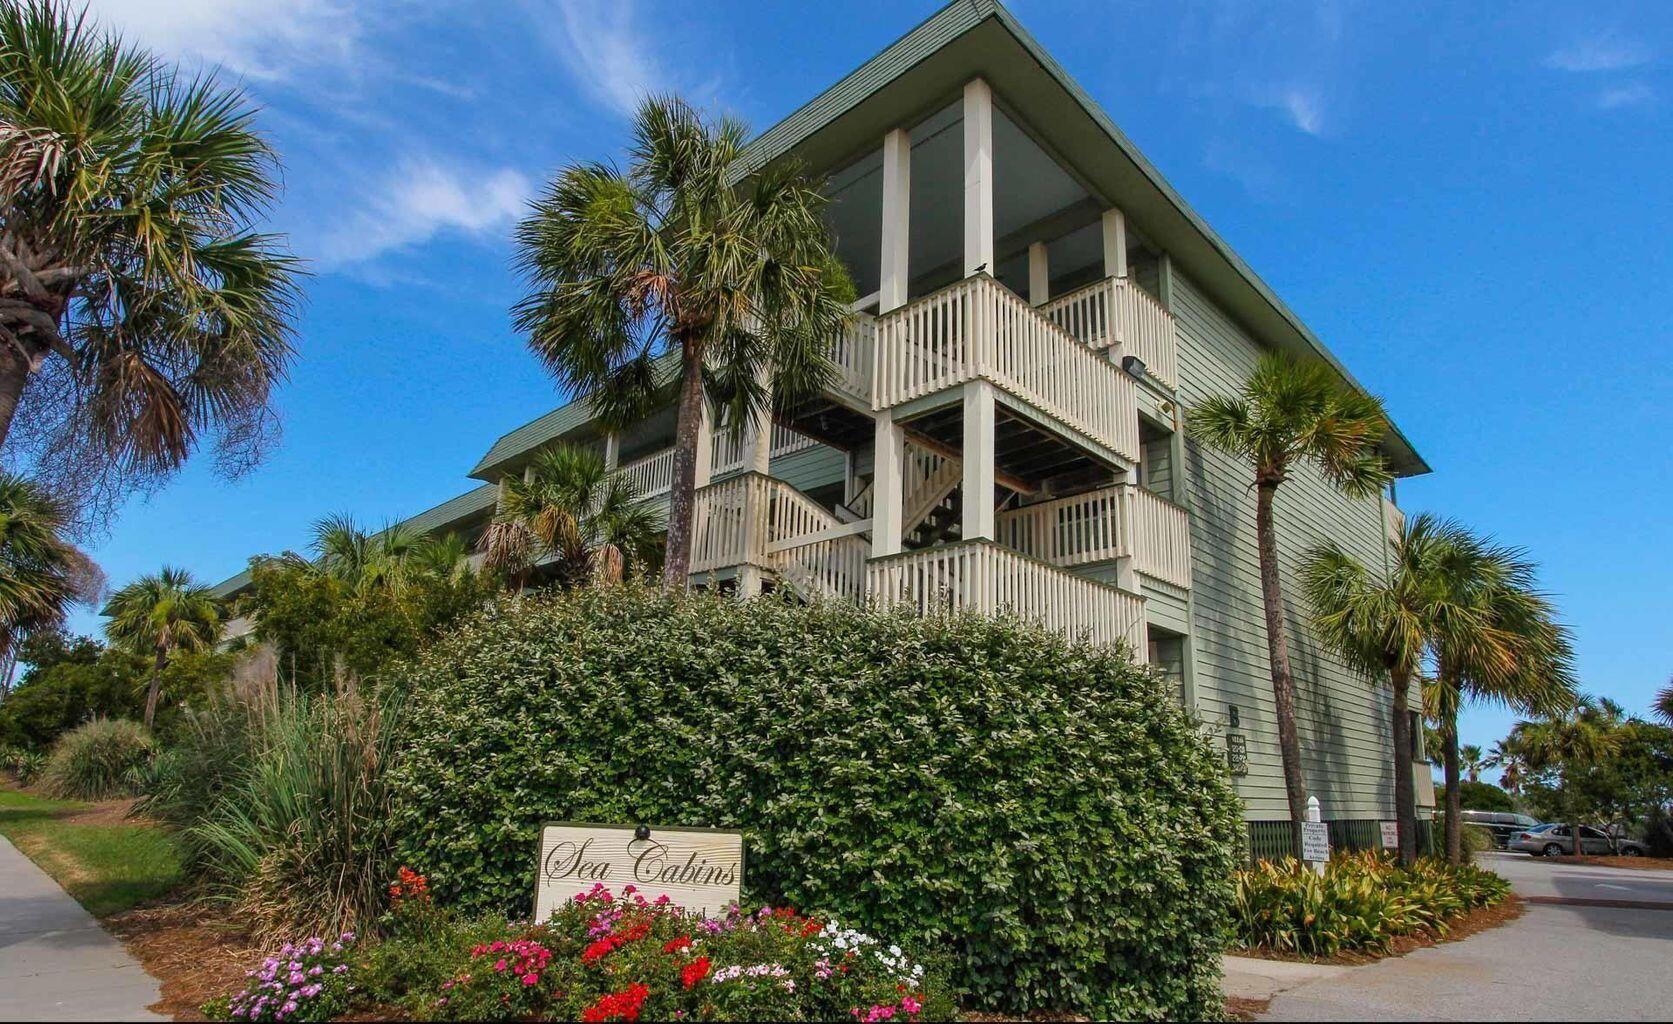 Sea Cabin On The Ocean Homes For Sale - 1300 Ocean Boulevard, Isle of Palms, SC - 0